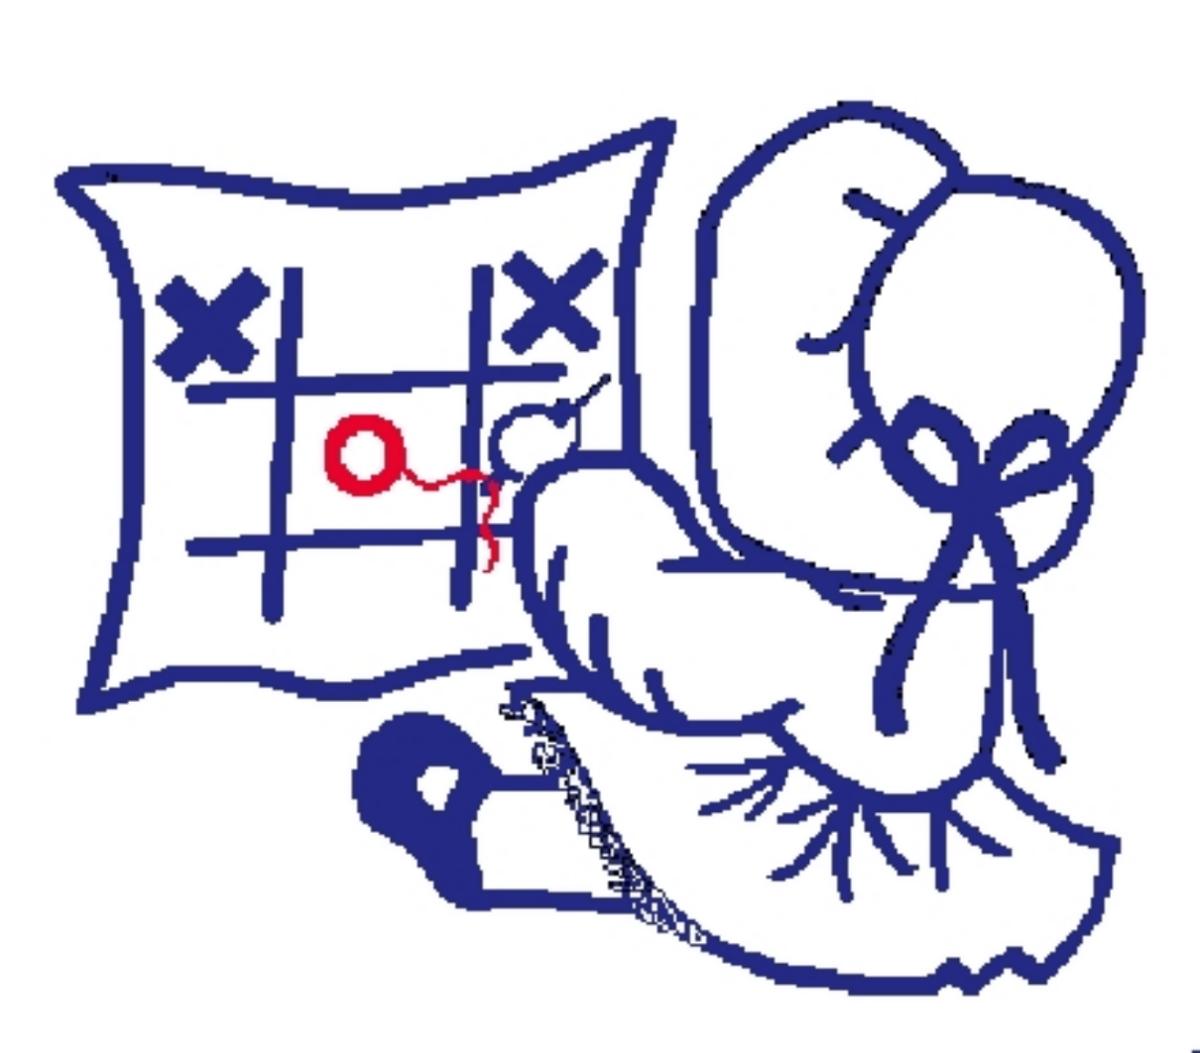 xs-ohs-logo